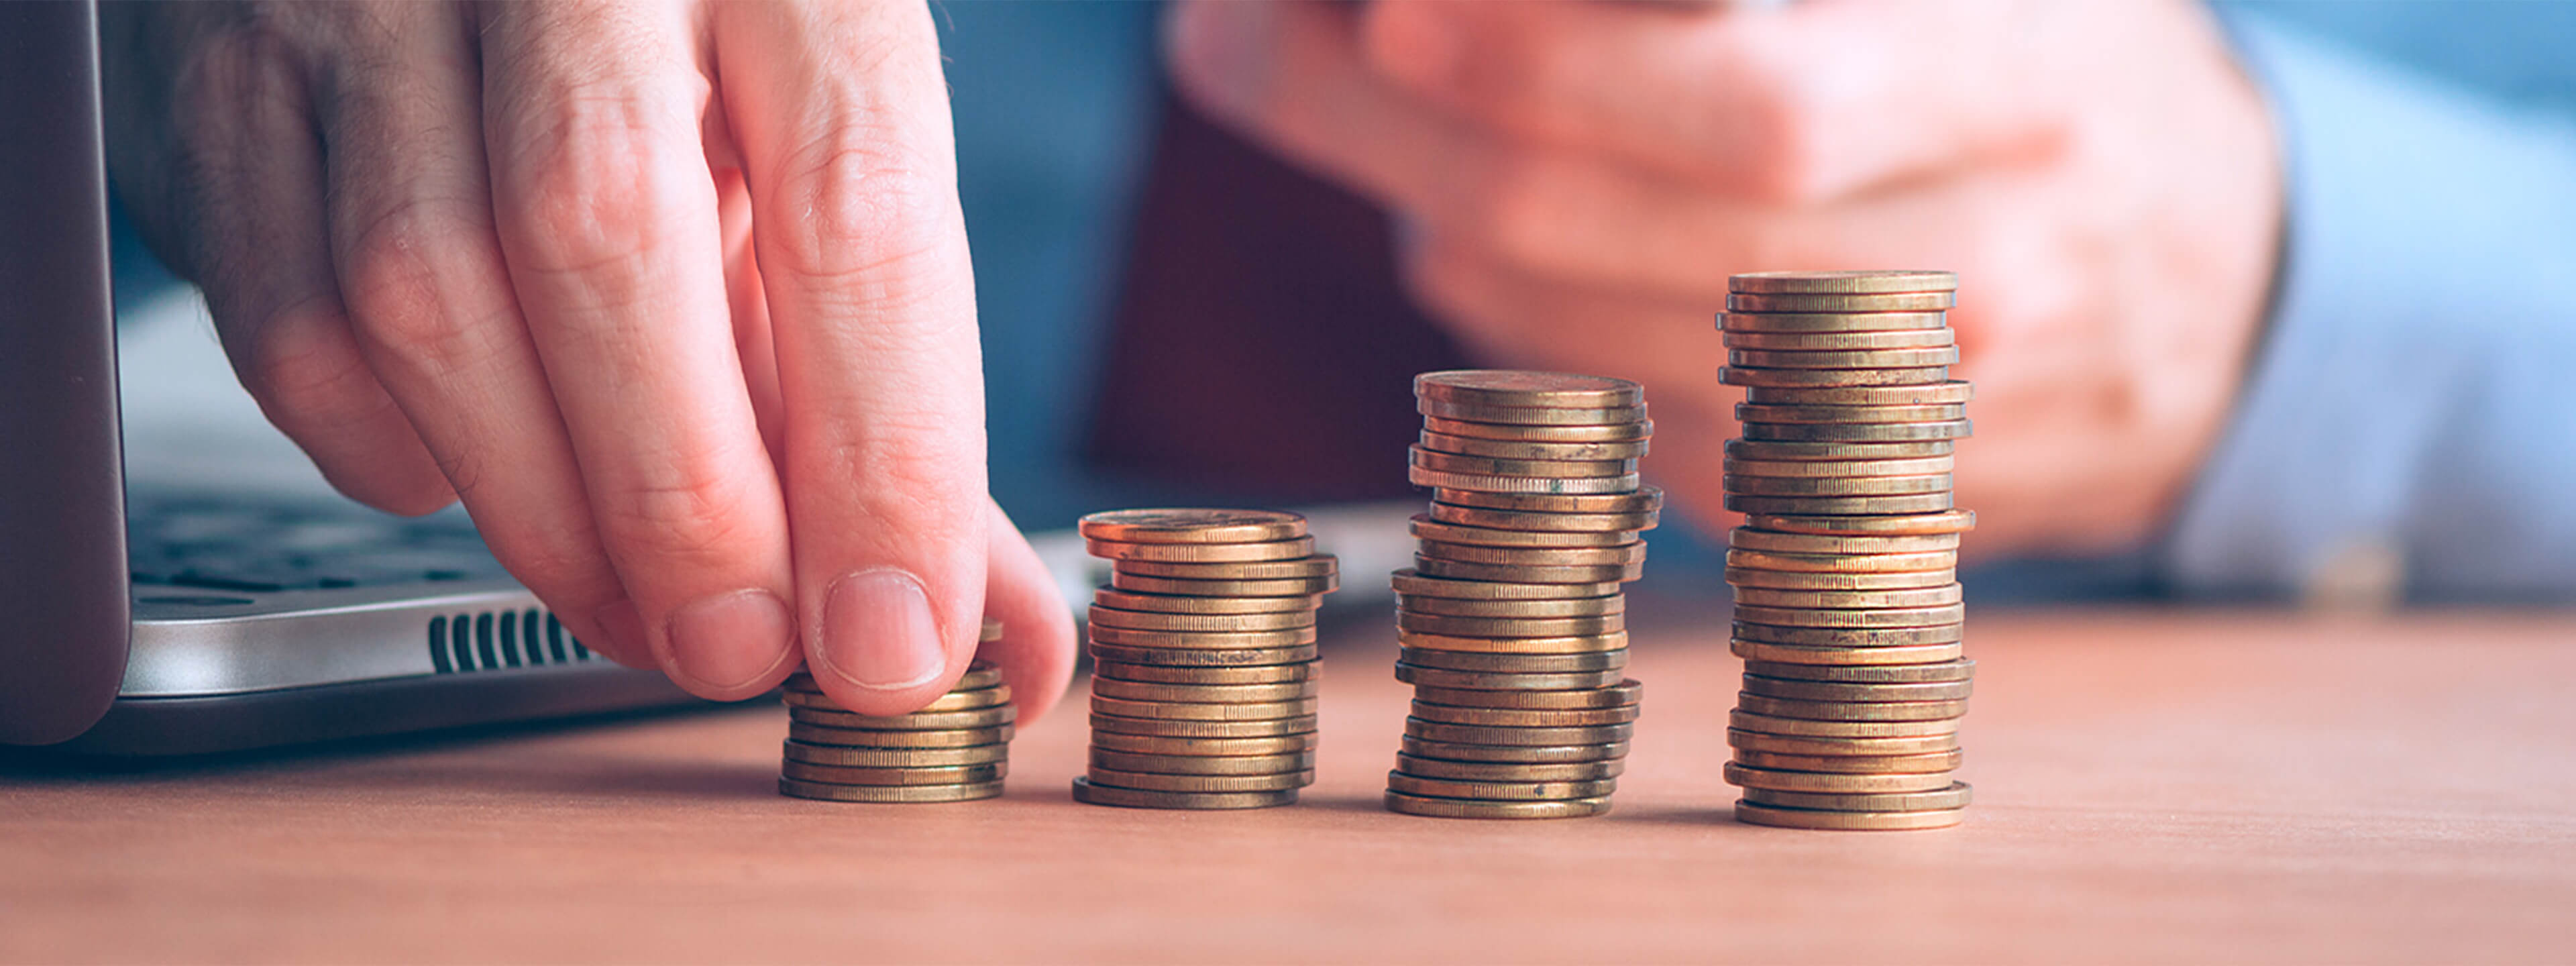 The return of Zero Based Budgeting